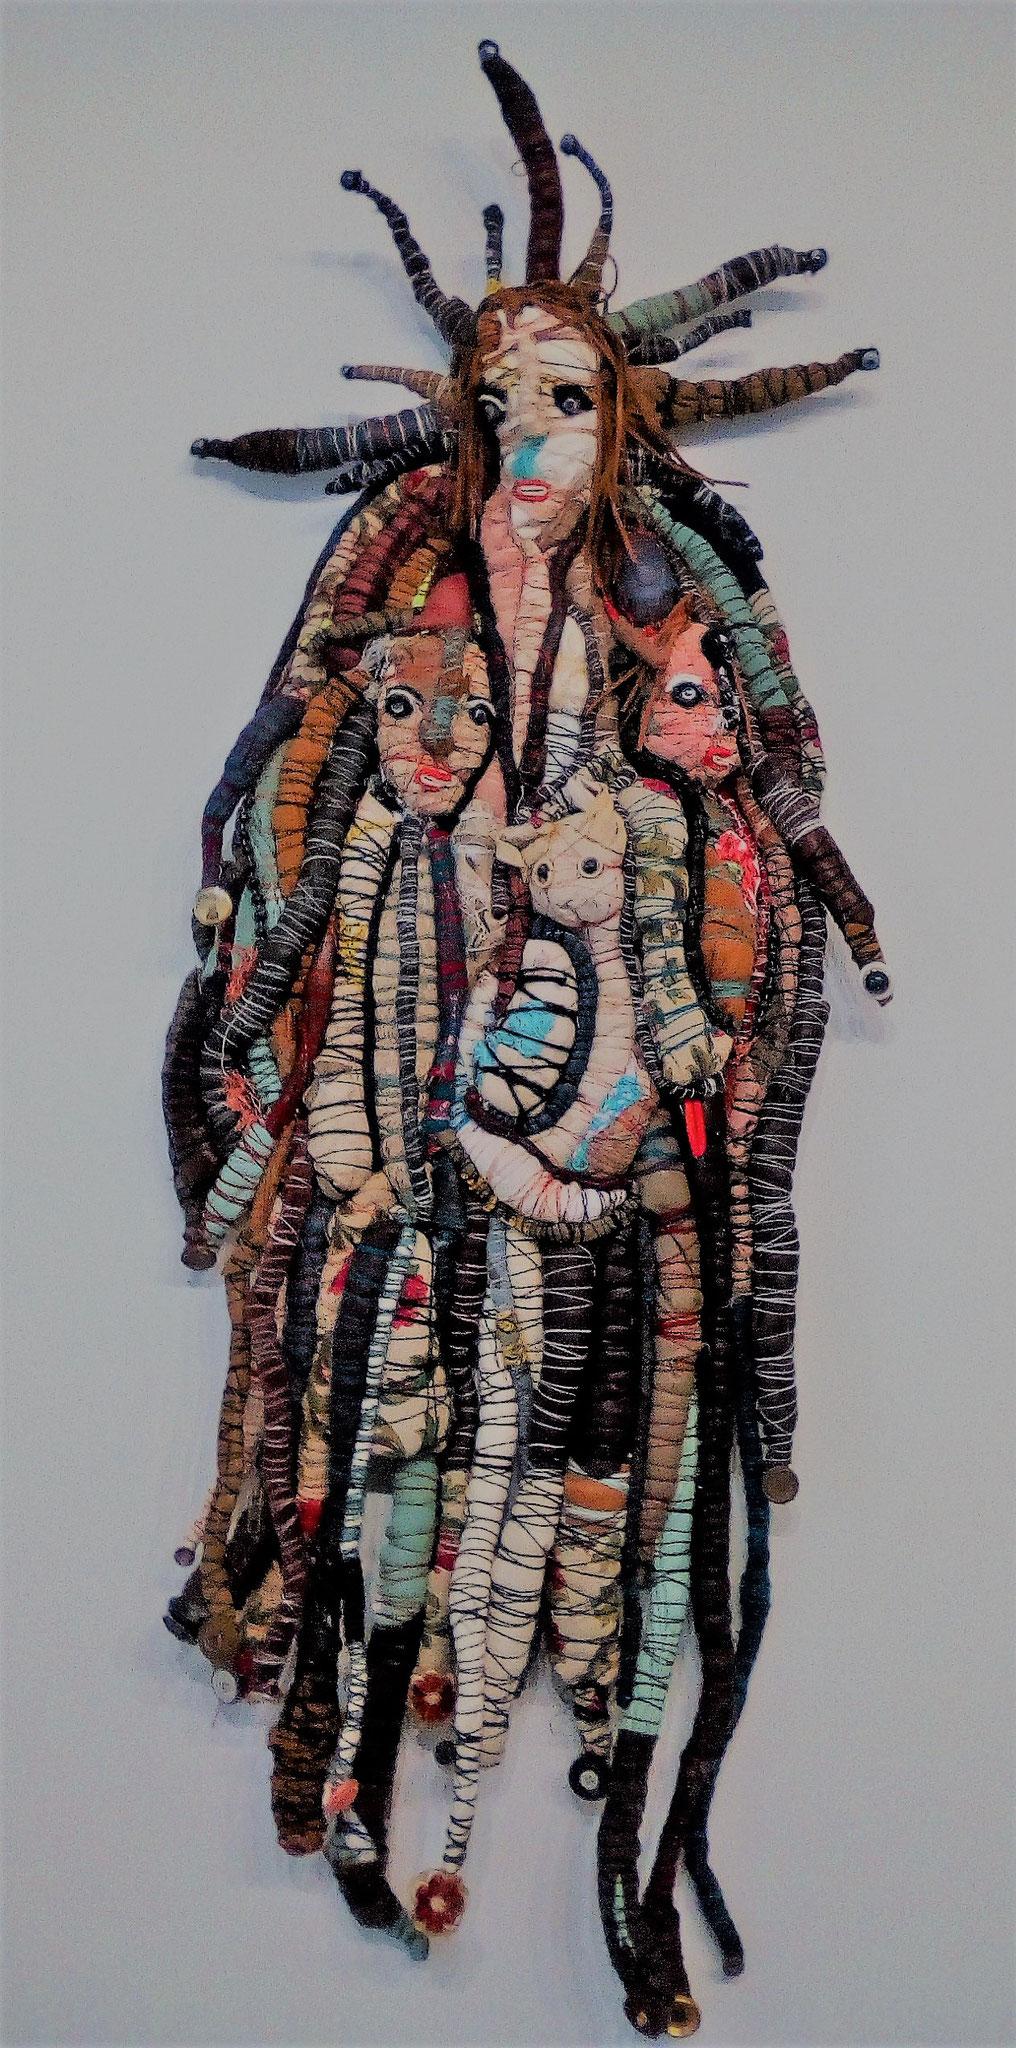 Hooloomouloo - 110 x 35 cm - Oeuvre de Virginie Chomette